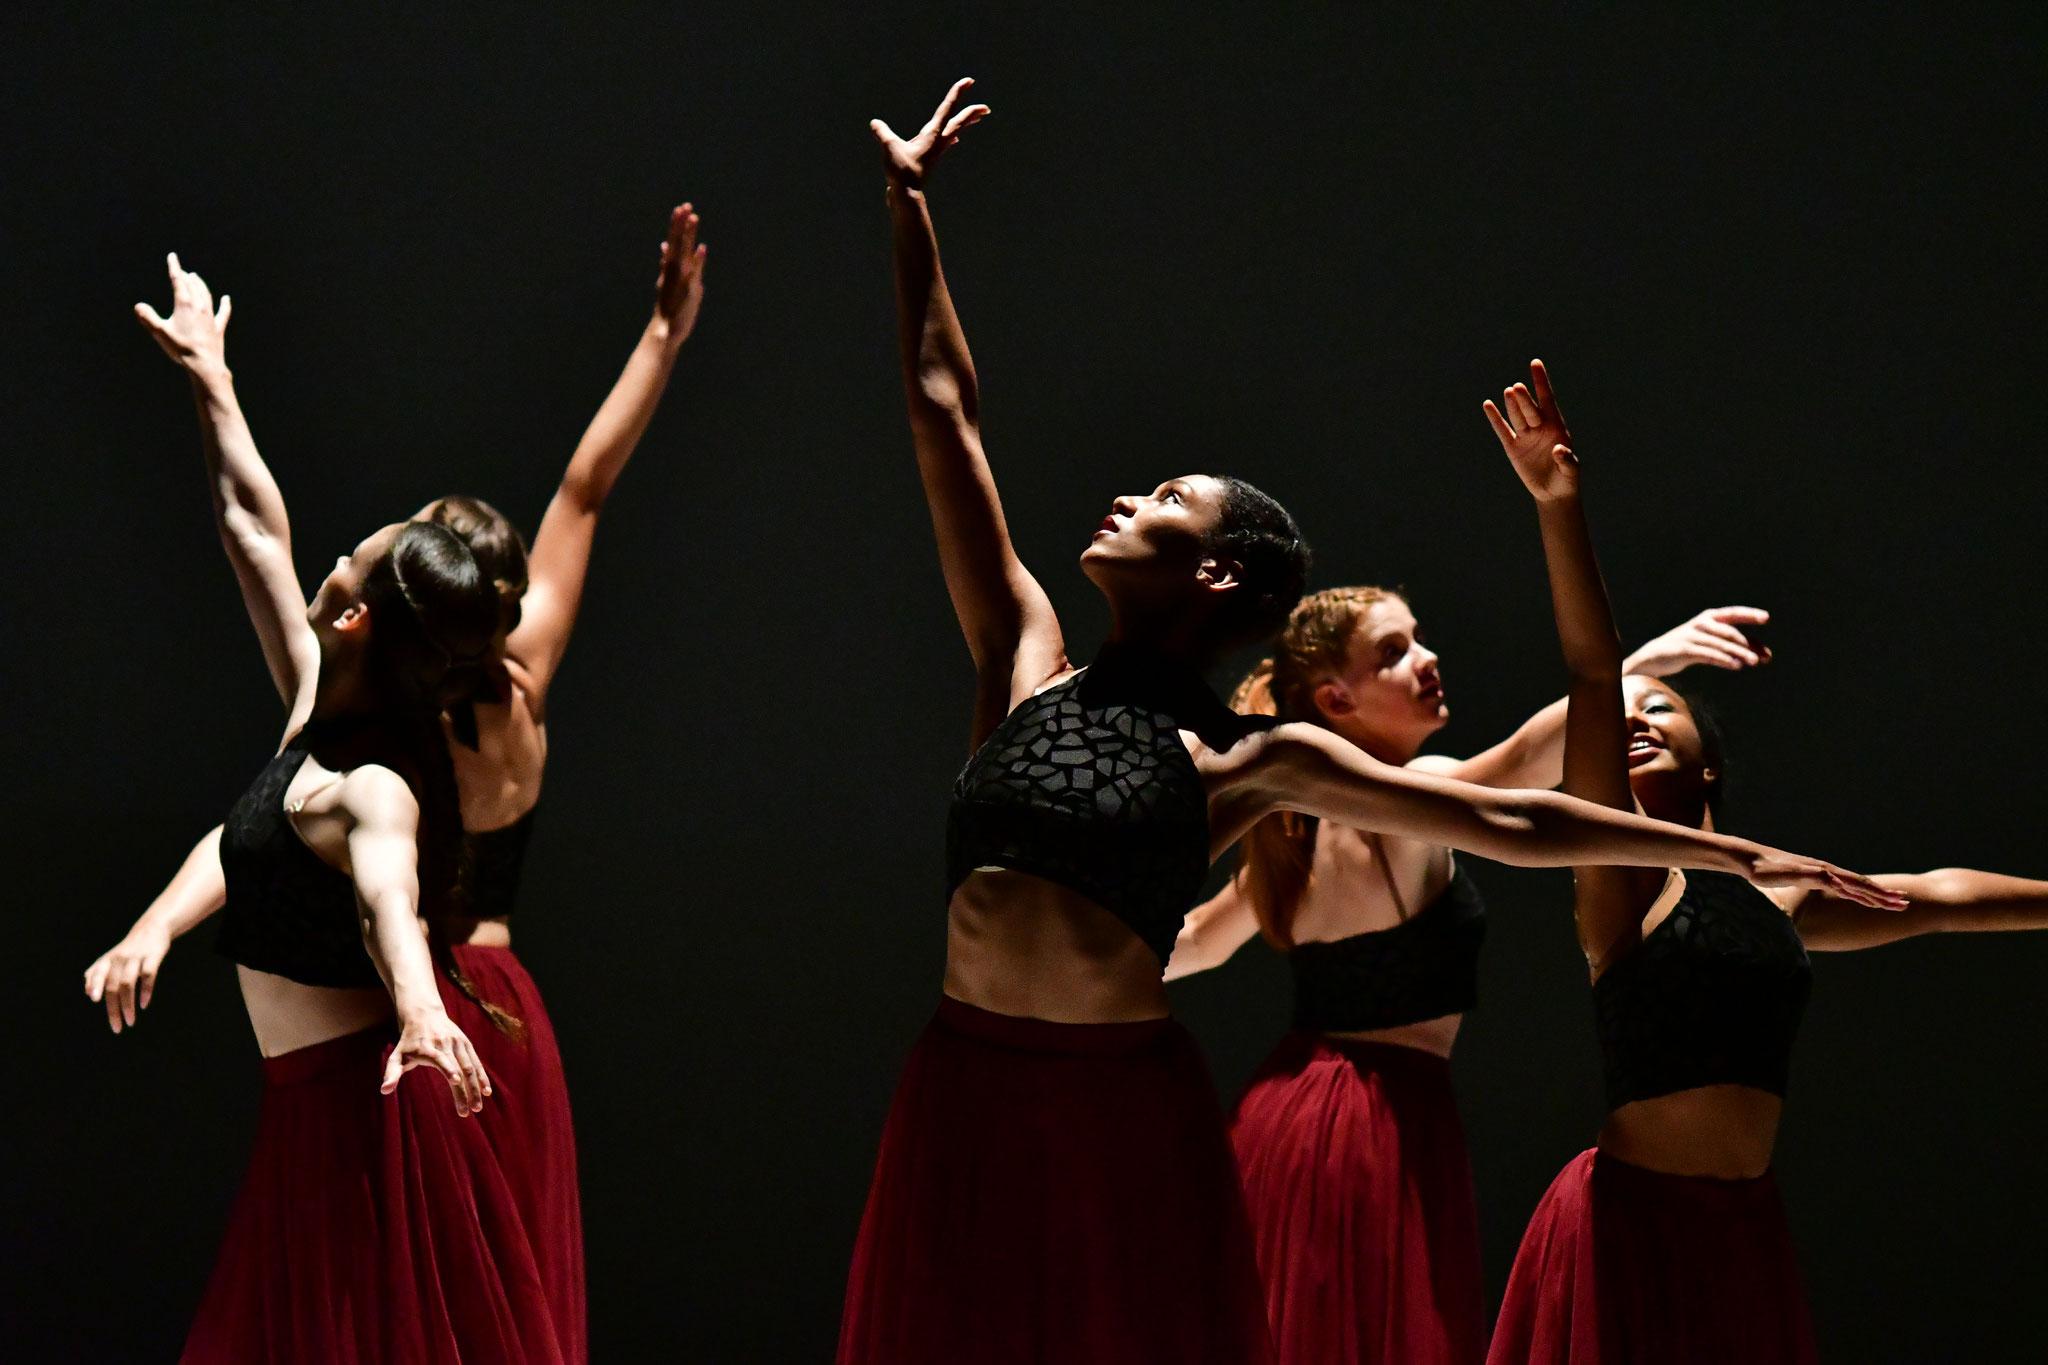 Lliona : option danse en tant qu'art - BAC 2017